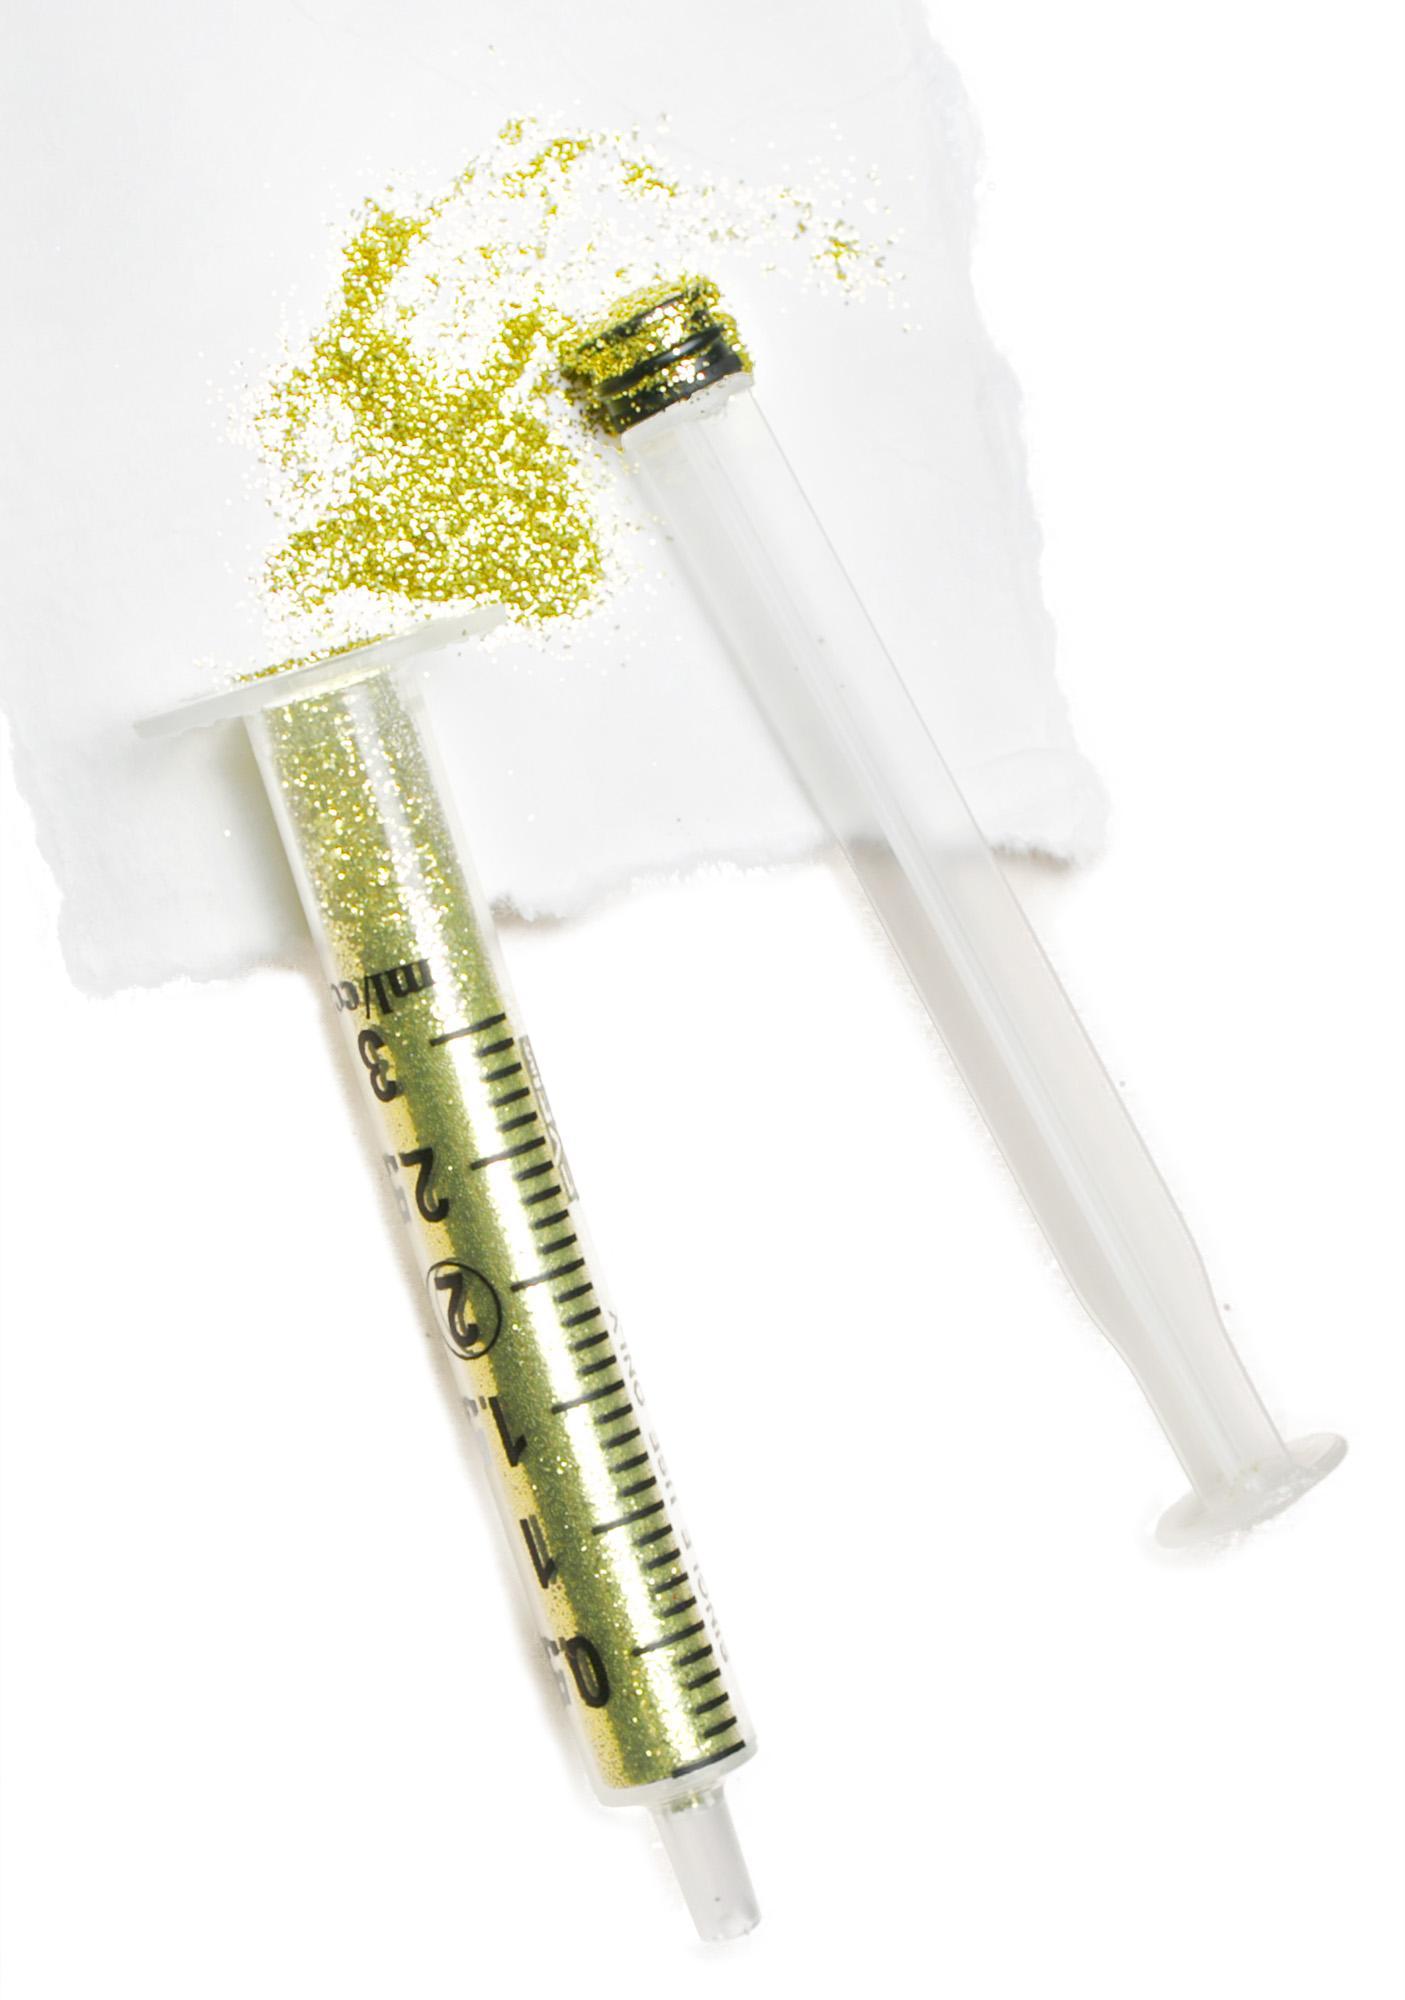 Glitter Injections Pineapple Express Glitter